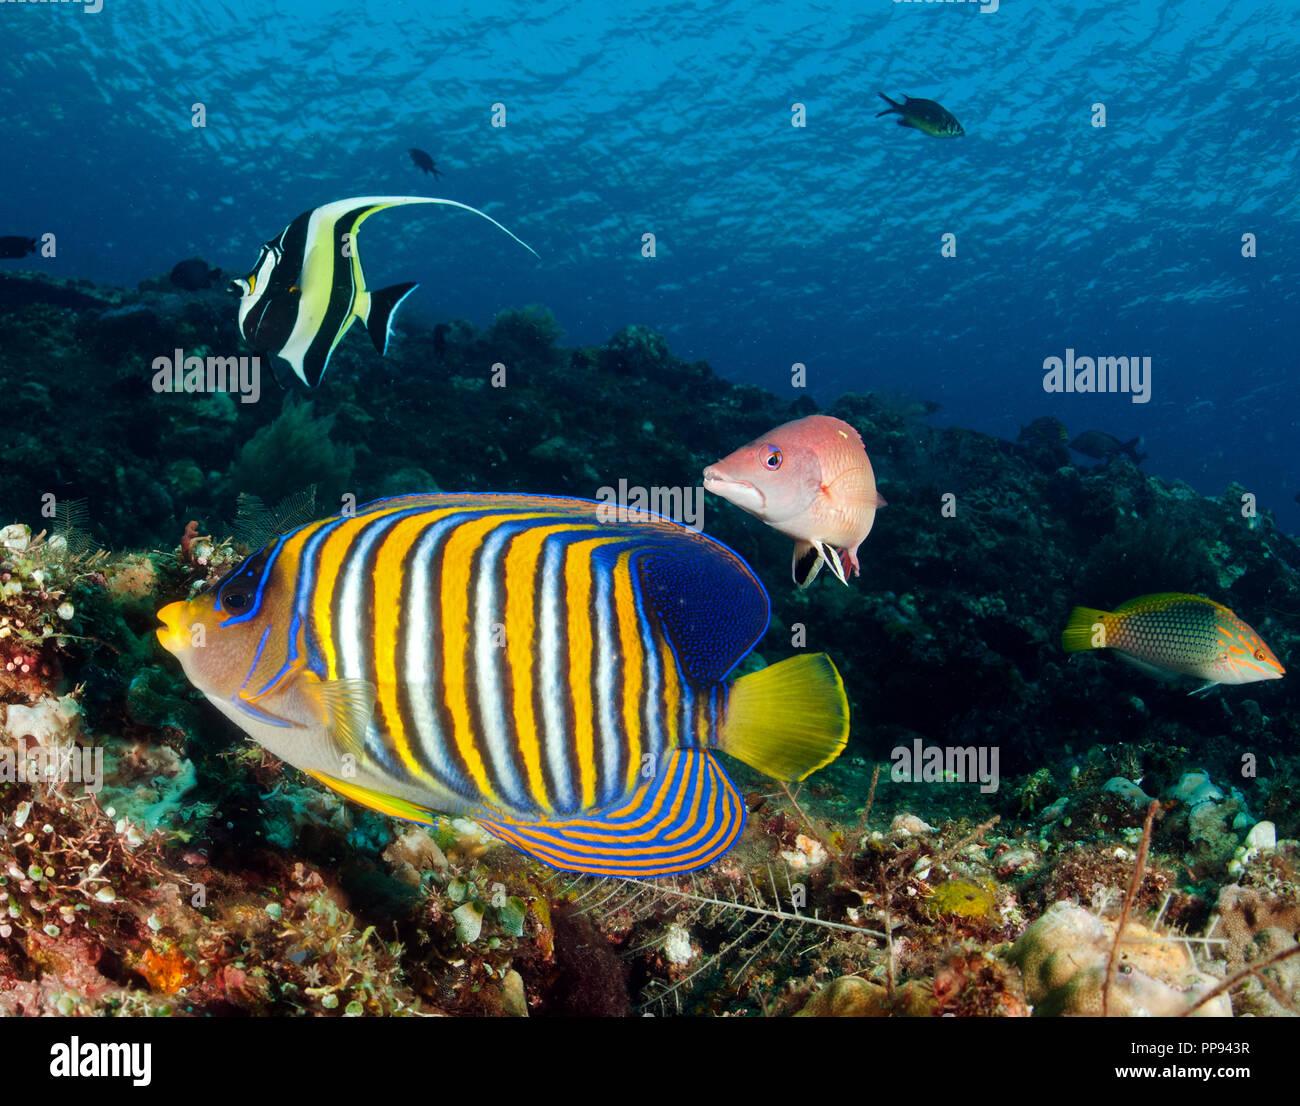 Reef scenic with Regal angelfish, Pygoplites diacanthus, Tulamben Bali Indonesia. - Stock Image